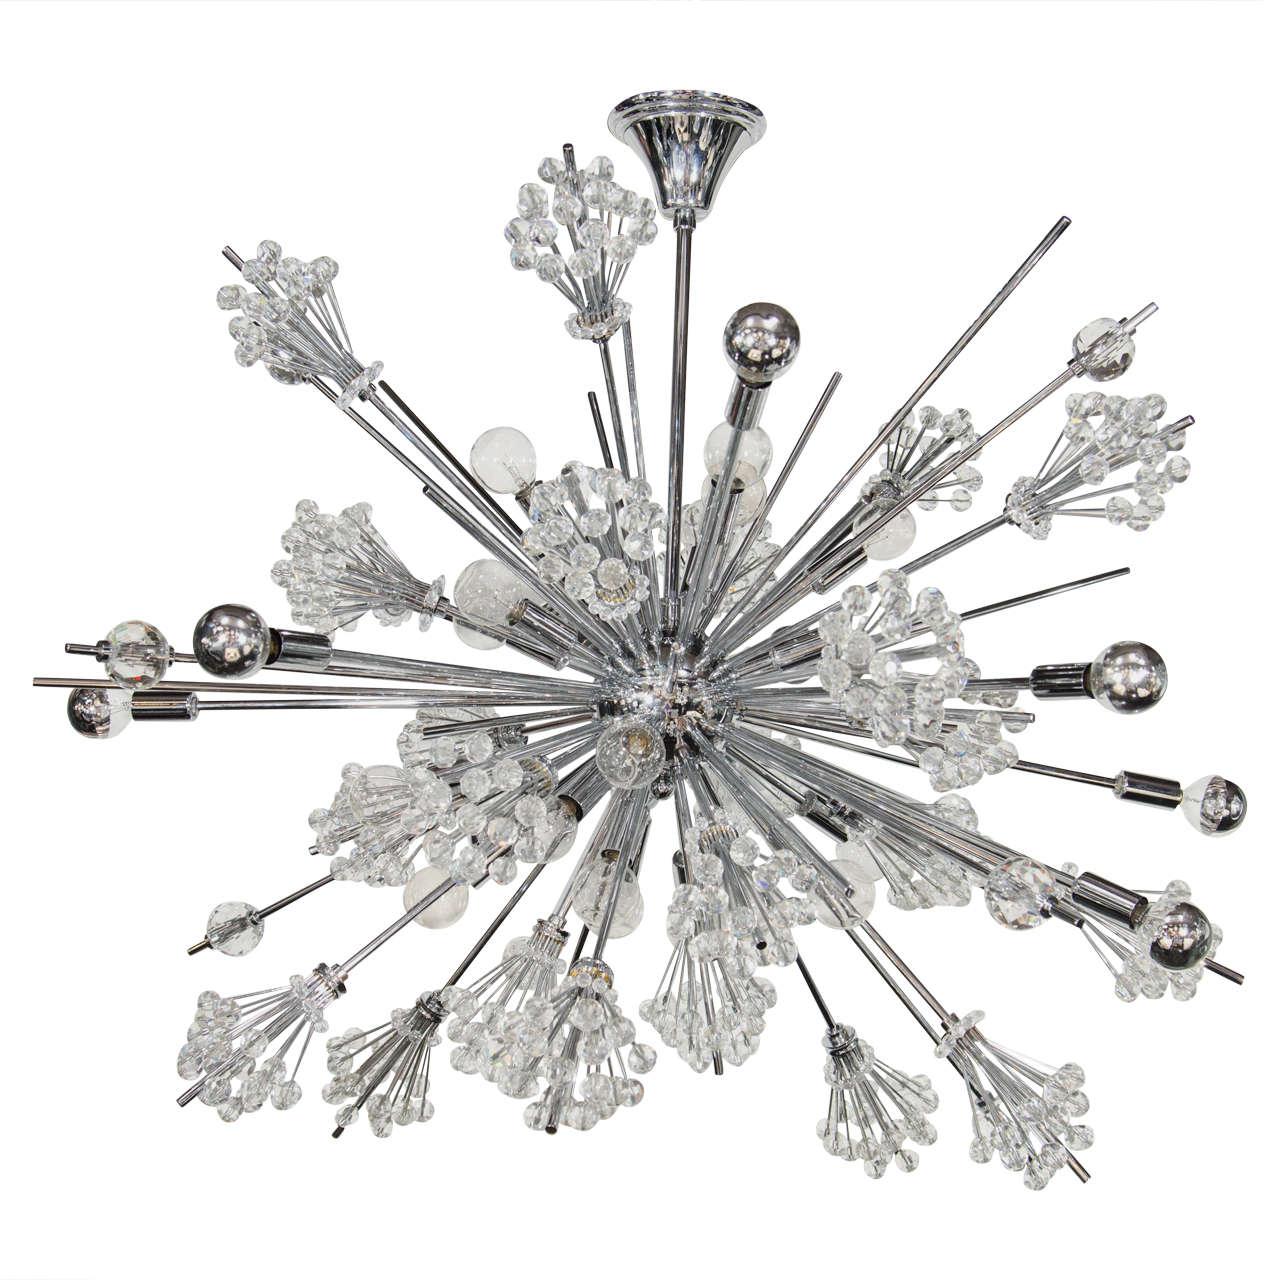 Exceptional sputnik chandelier by lobmeyr featuring fine for Sputnik chandelier